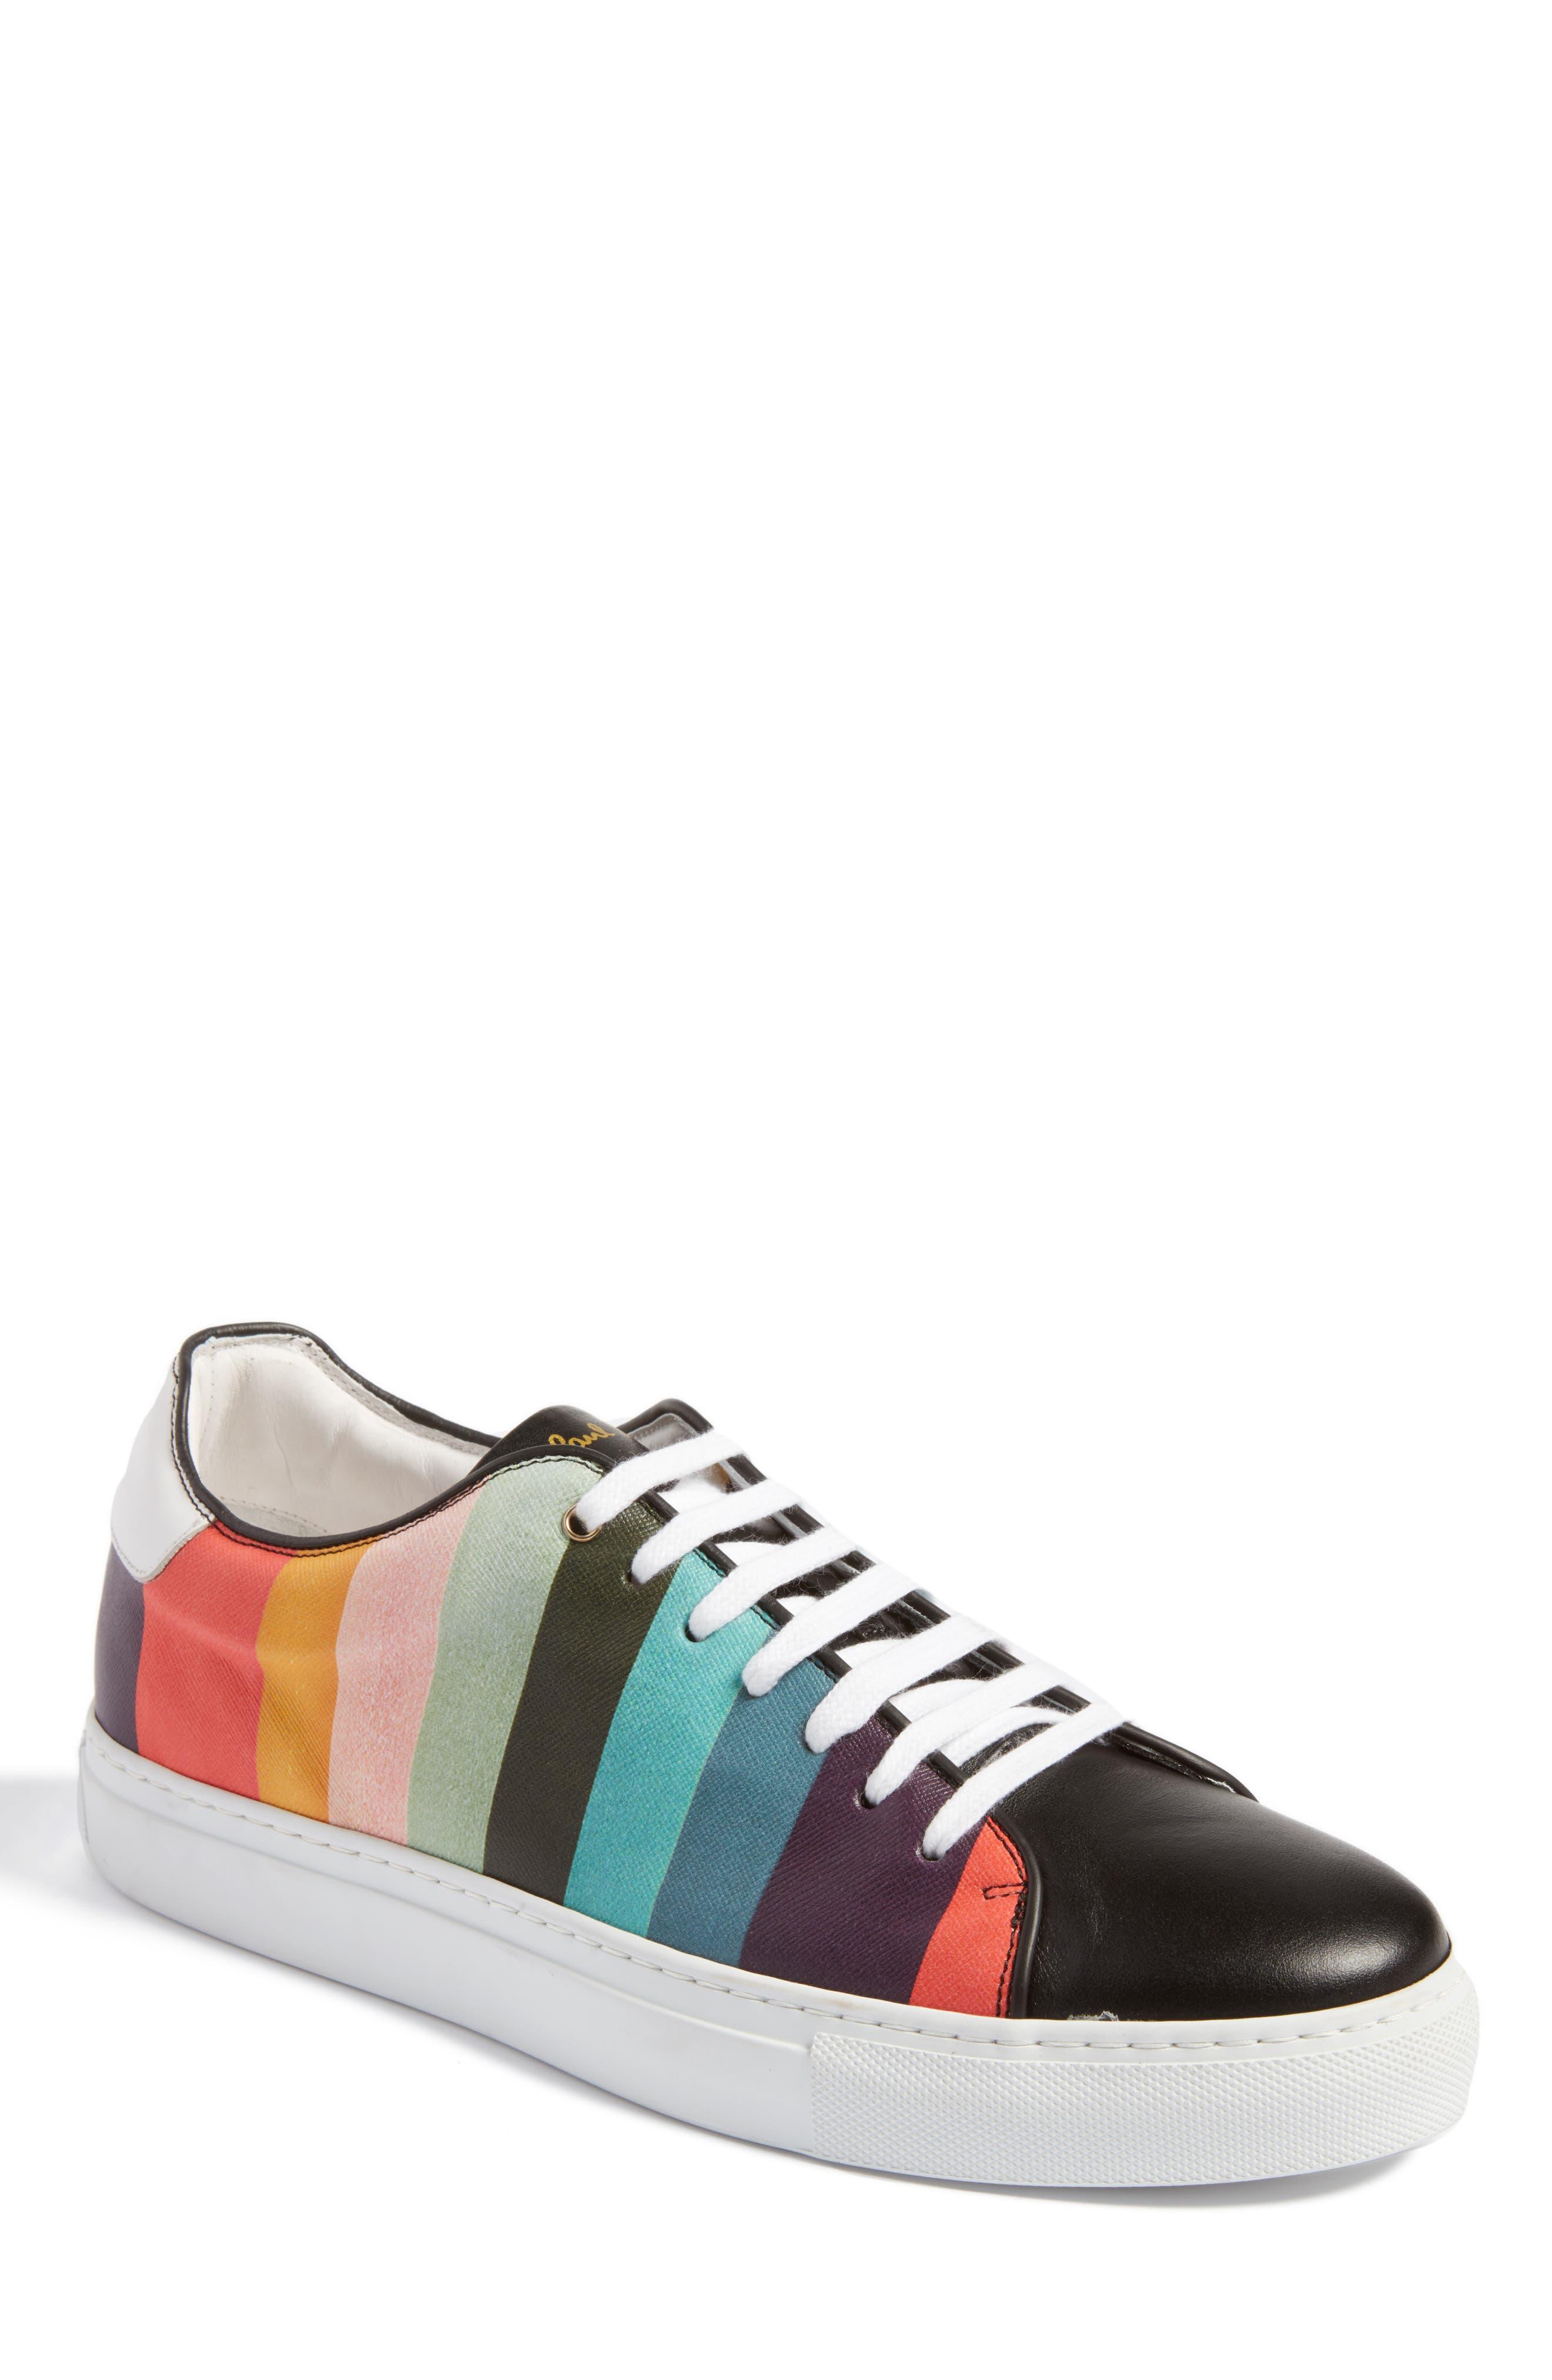 Basso Sneaker,                             Main thumbnail 1, color,                             001